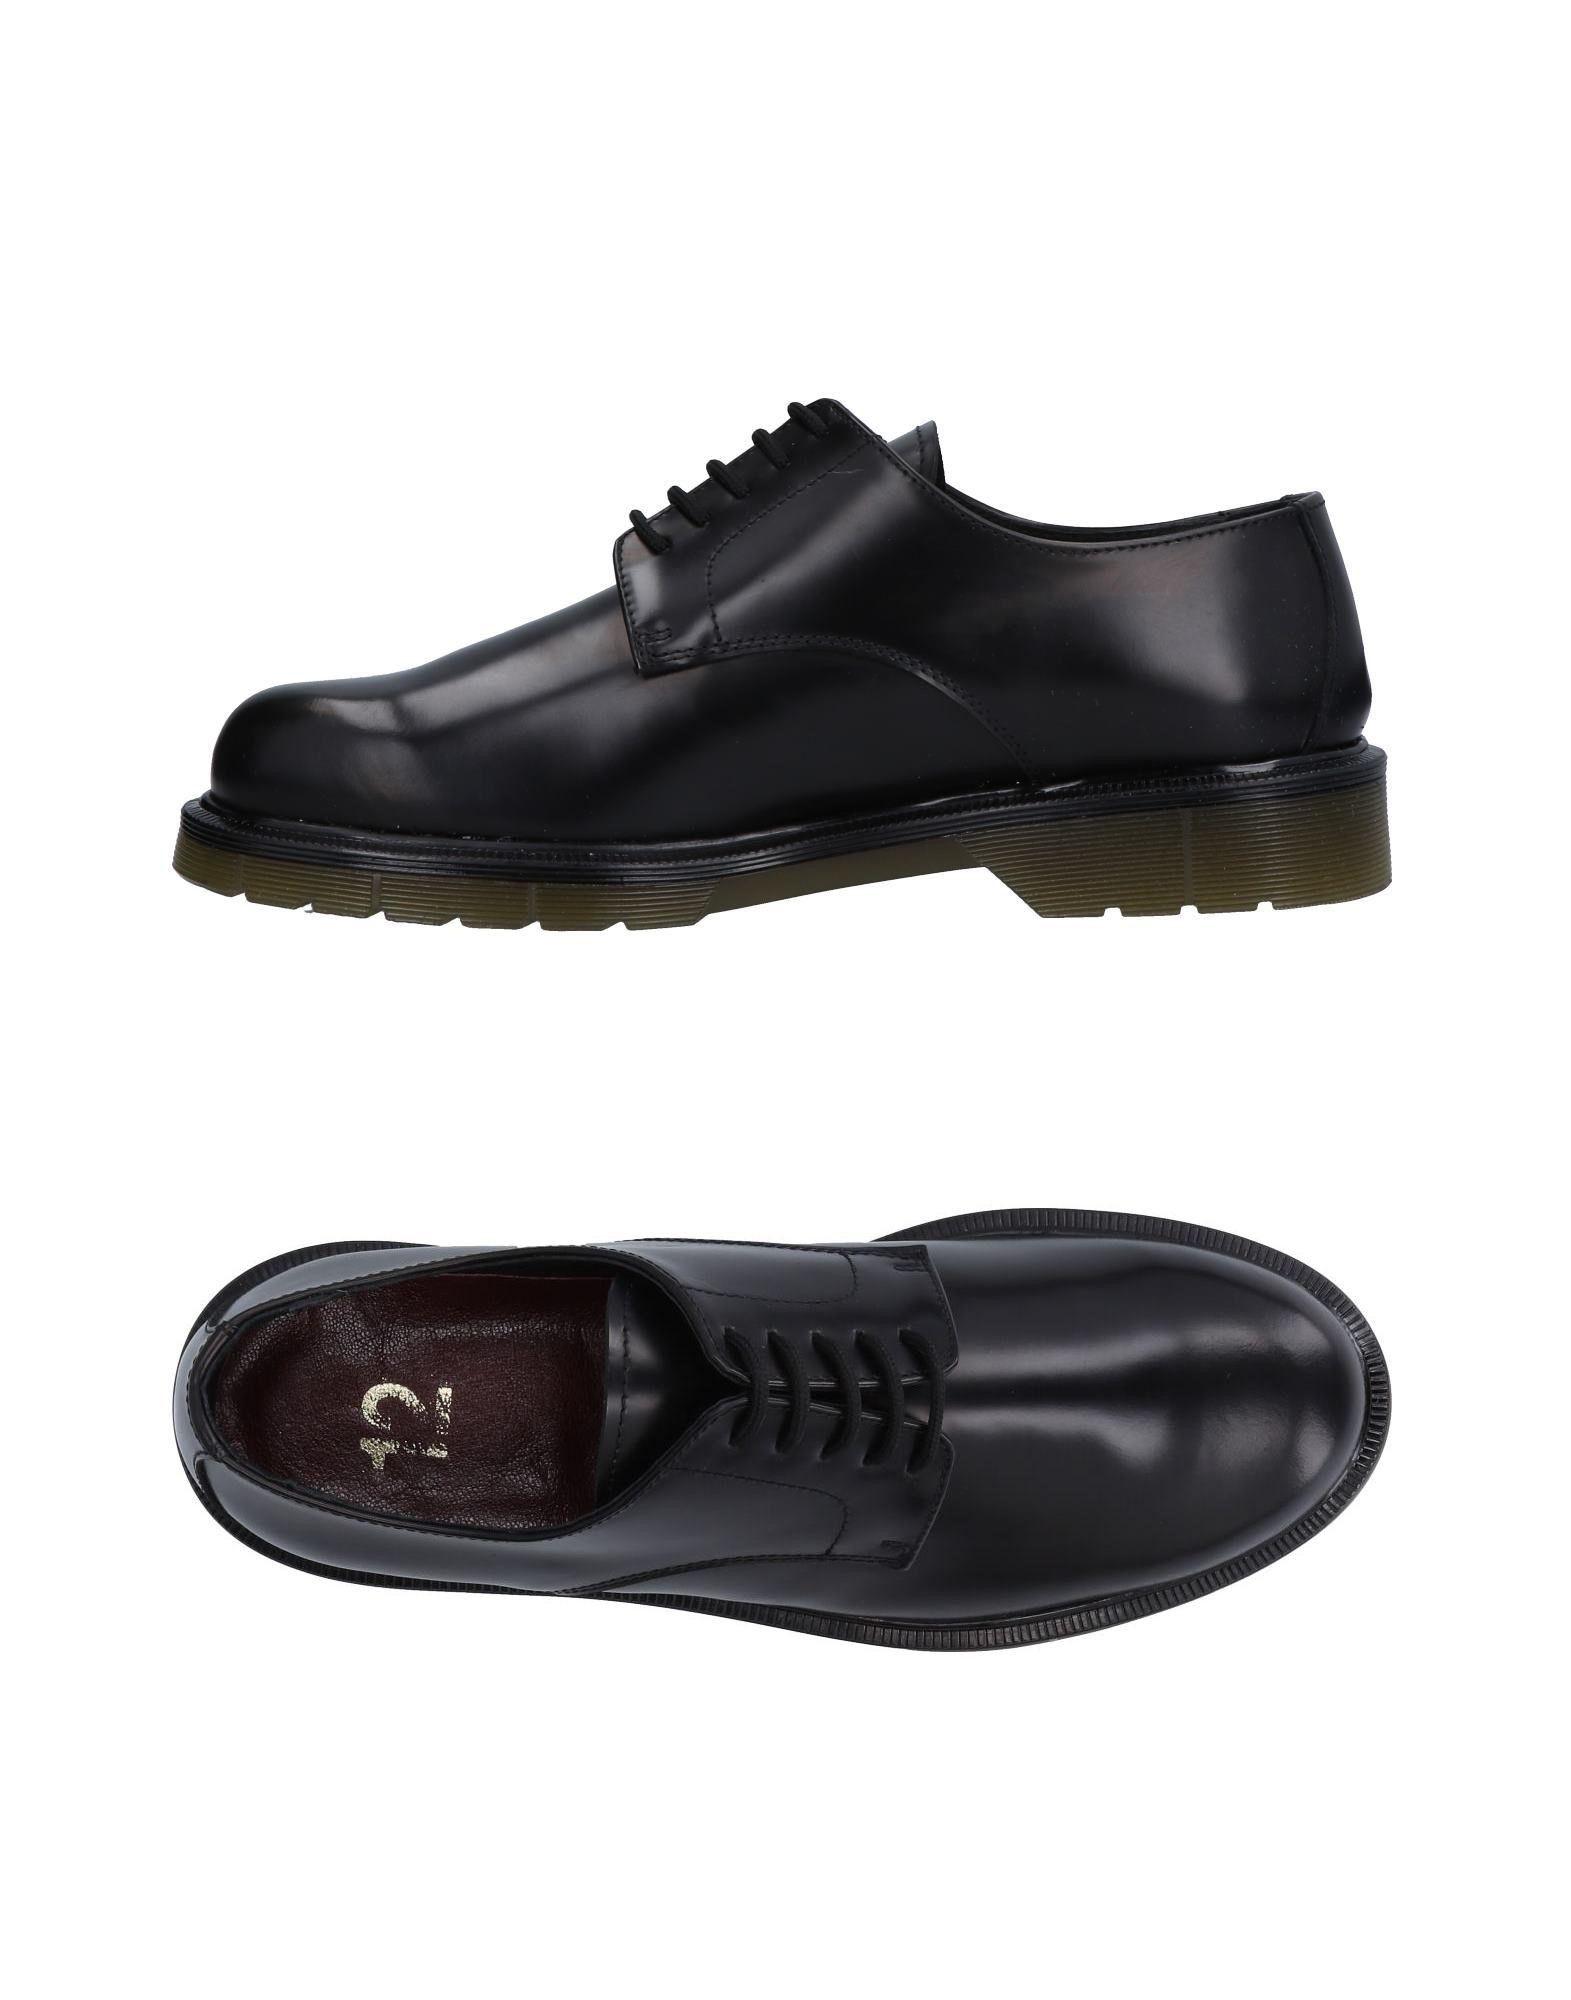 Tsd12 Schnürschuhe Herren  11504116AK Gute Qualität beliebte Schuhe